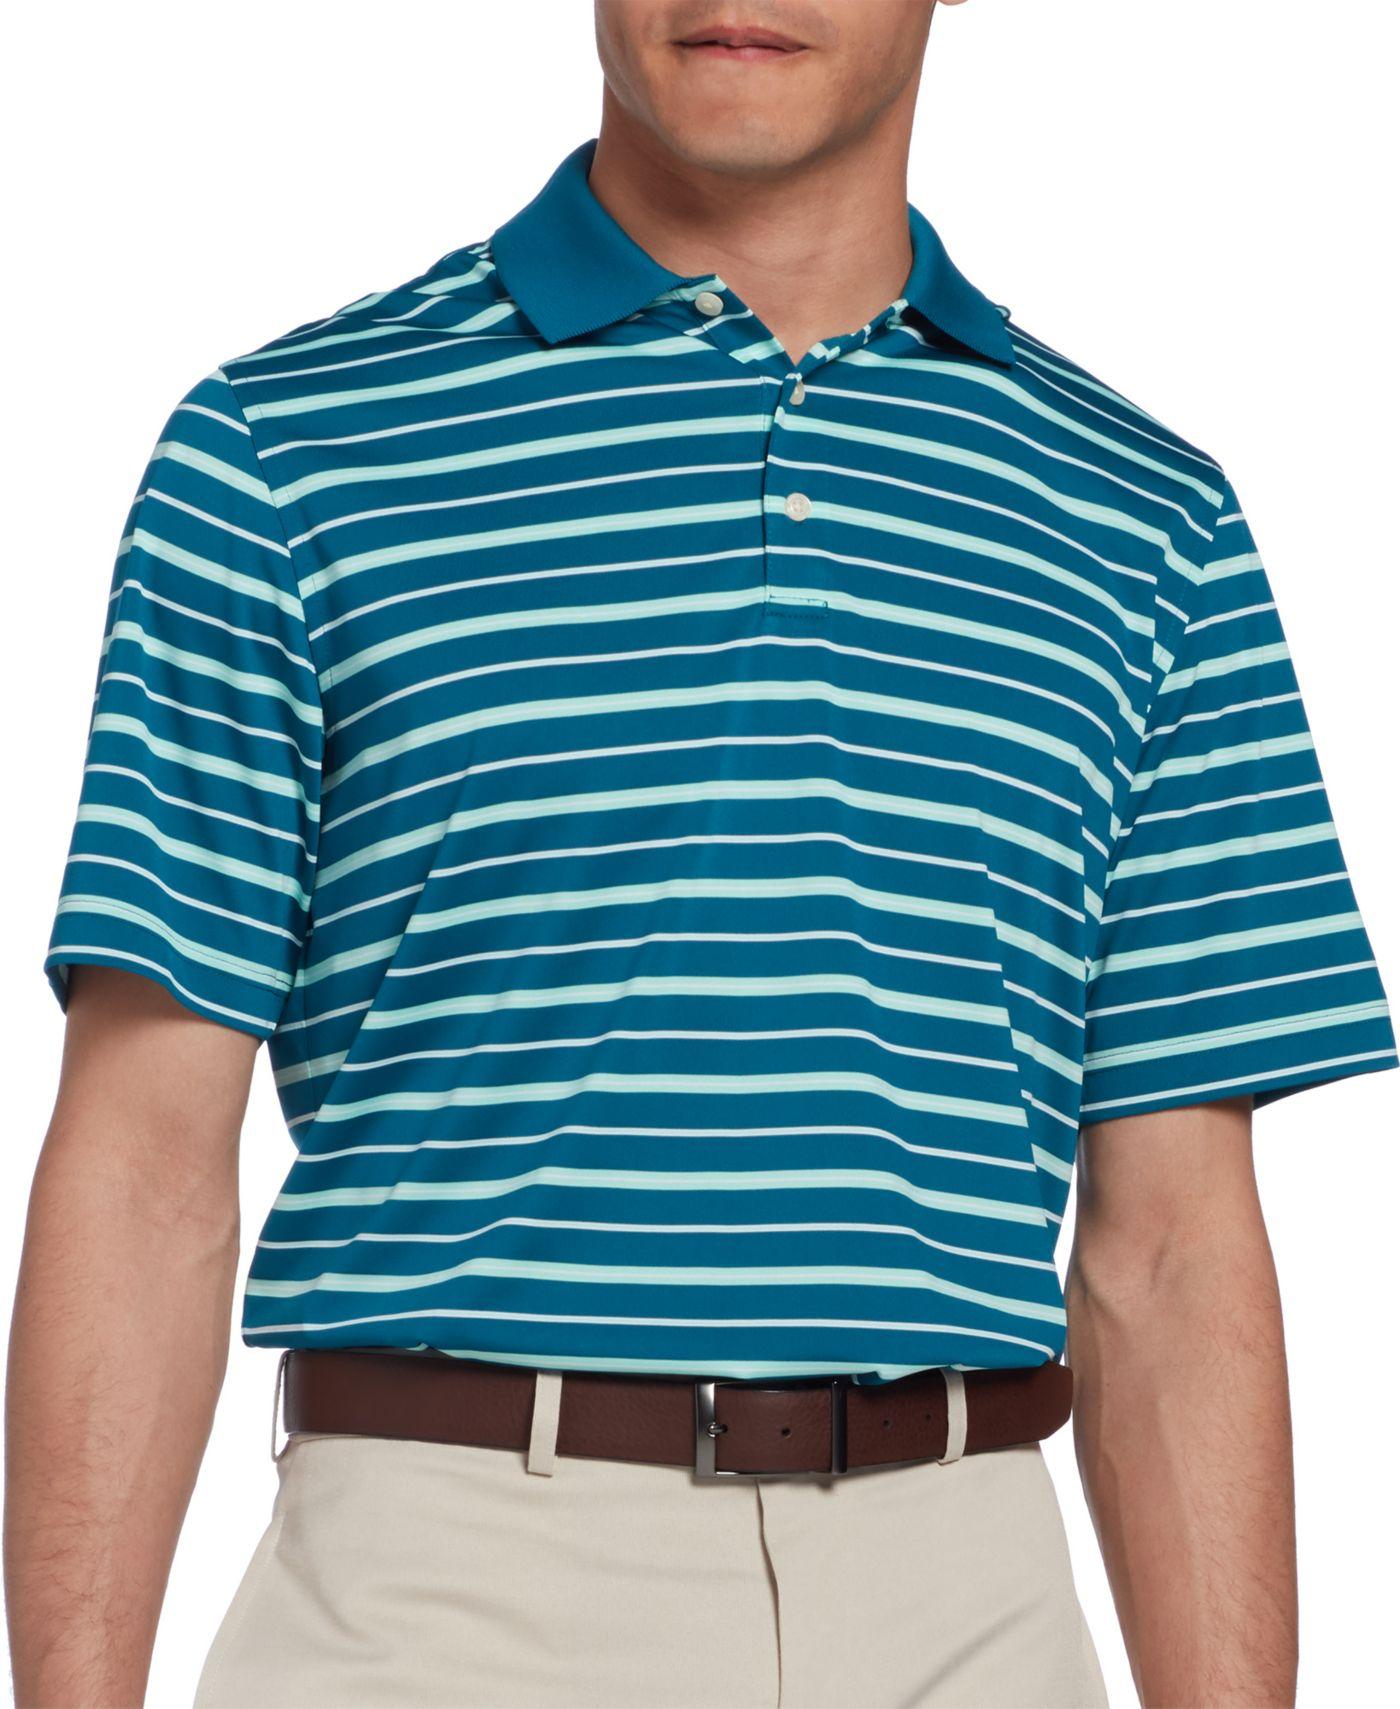 Walter Hagen Men's Essential Fairway Wide Stripe Golf Polo